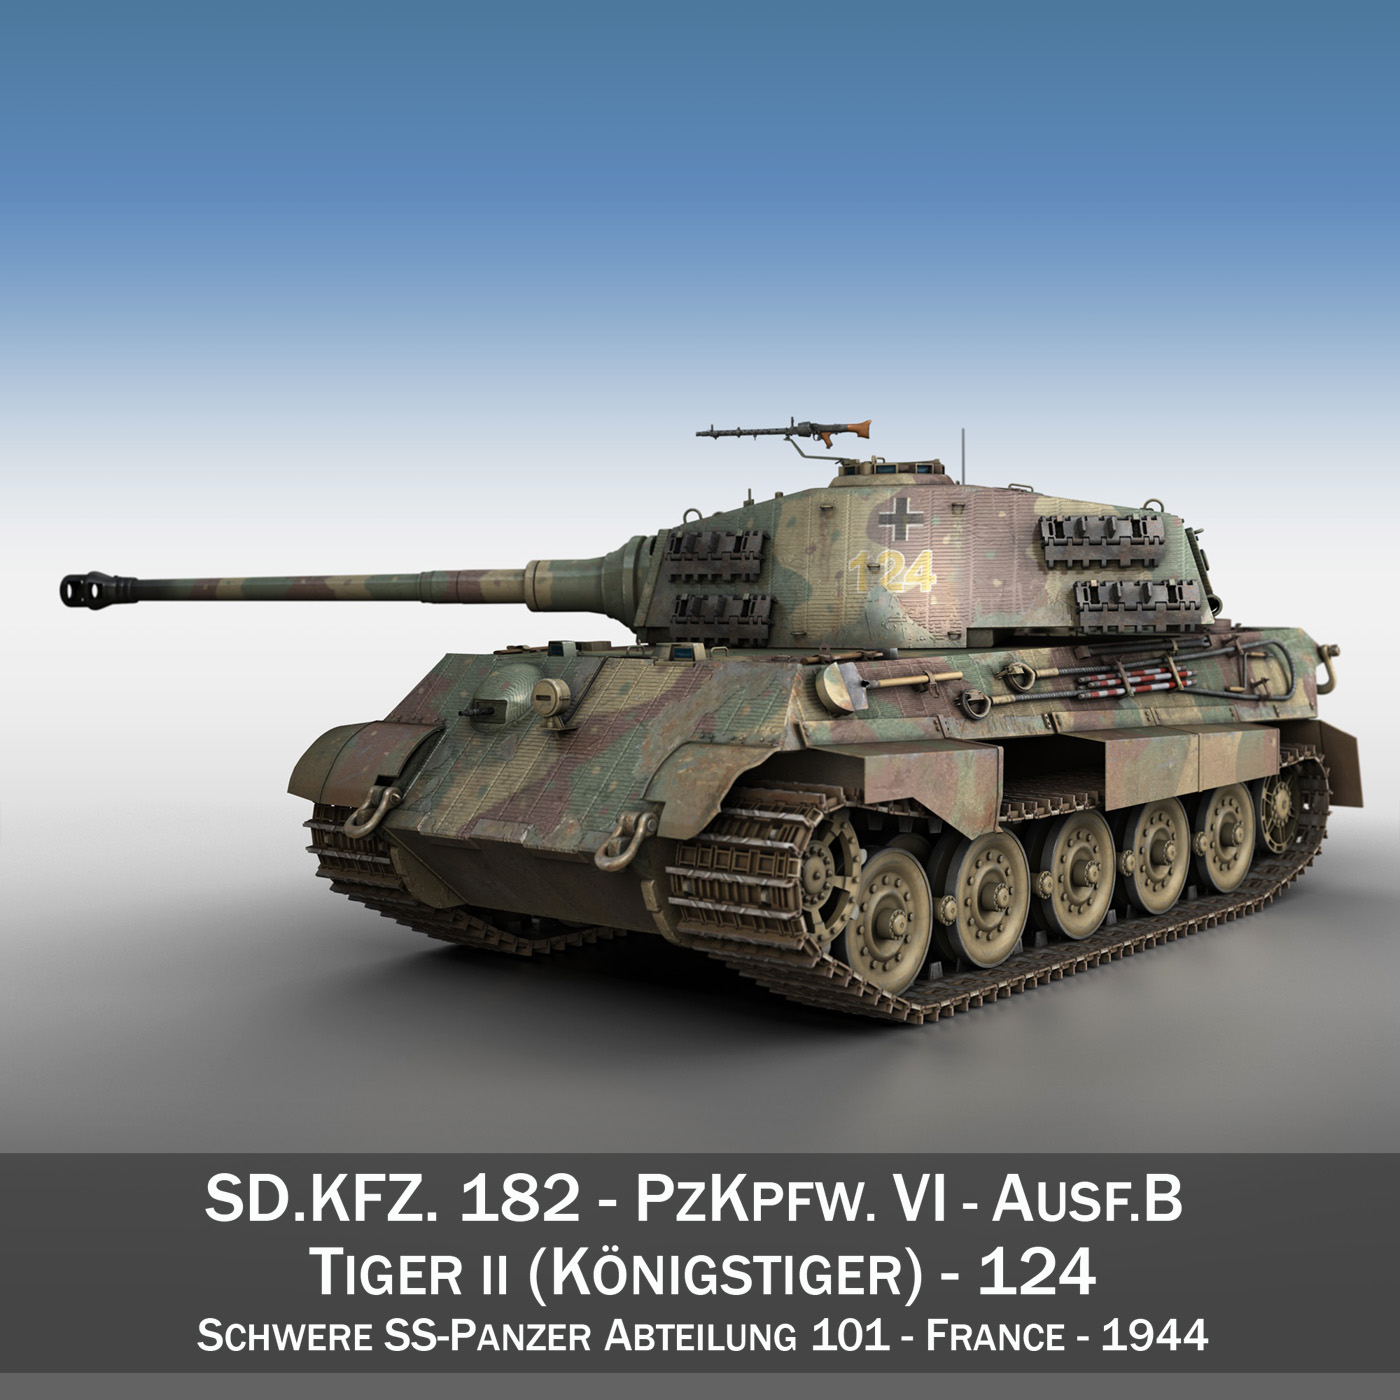 panzerkampfwagen vi – ausf.b – tiger ii – 124 3d model 3ds c4d lwo obj 190031